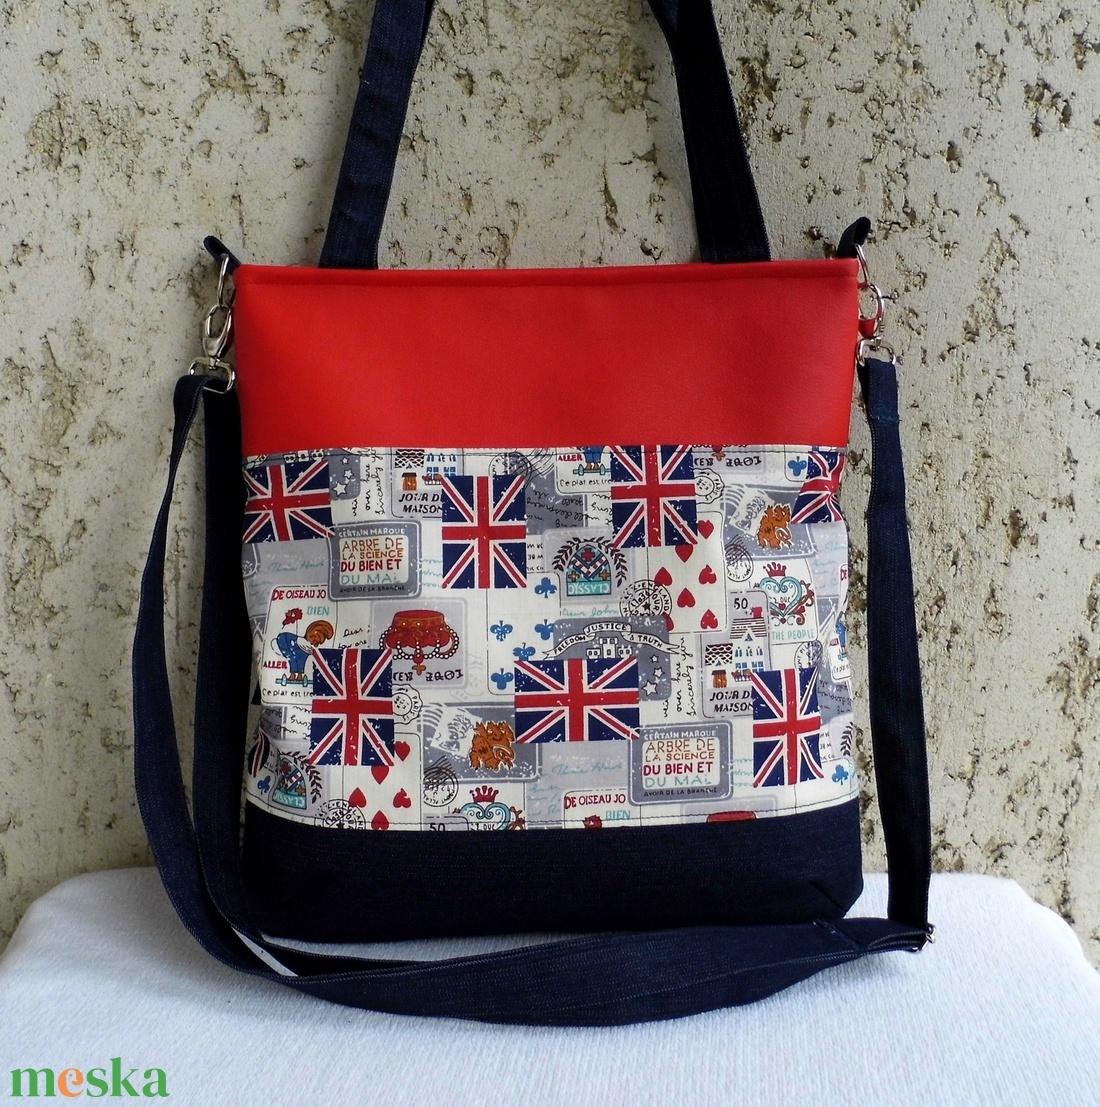 LONDON - pakolós női táska (smagdi) - Meska.hu 146fb3f688